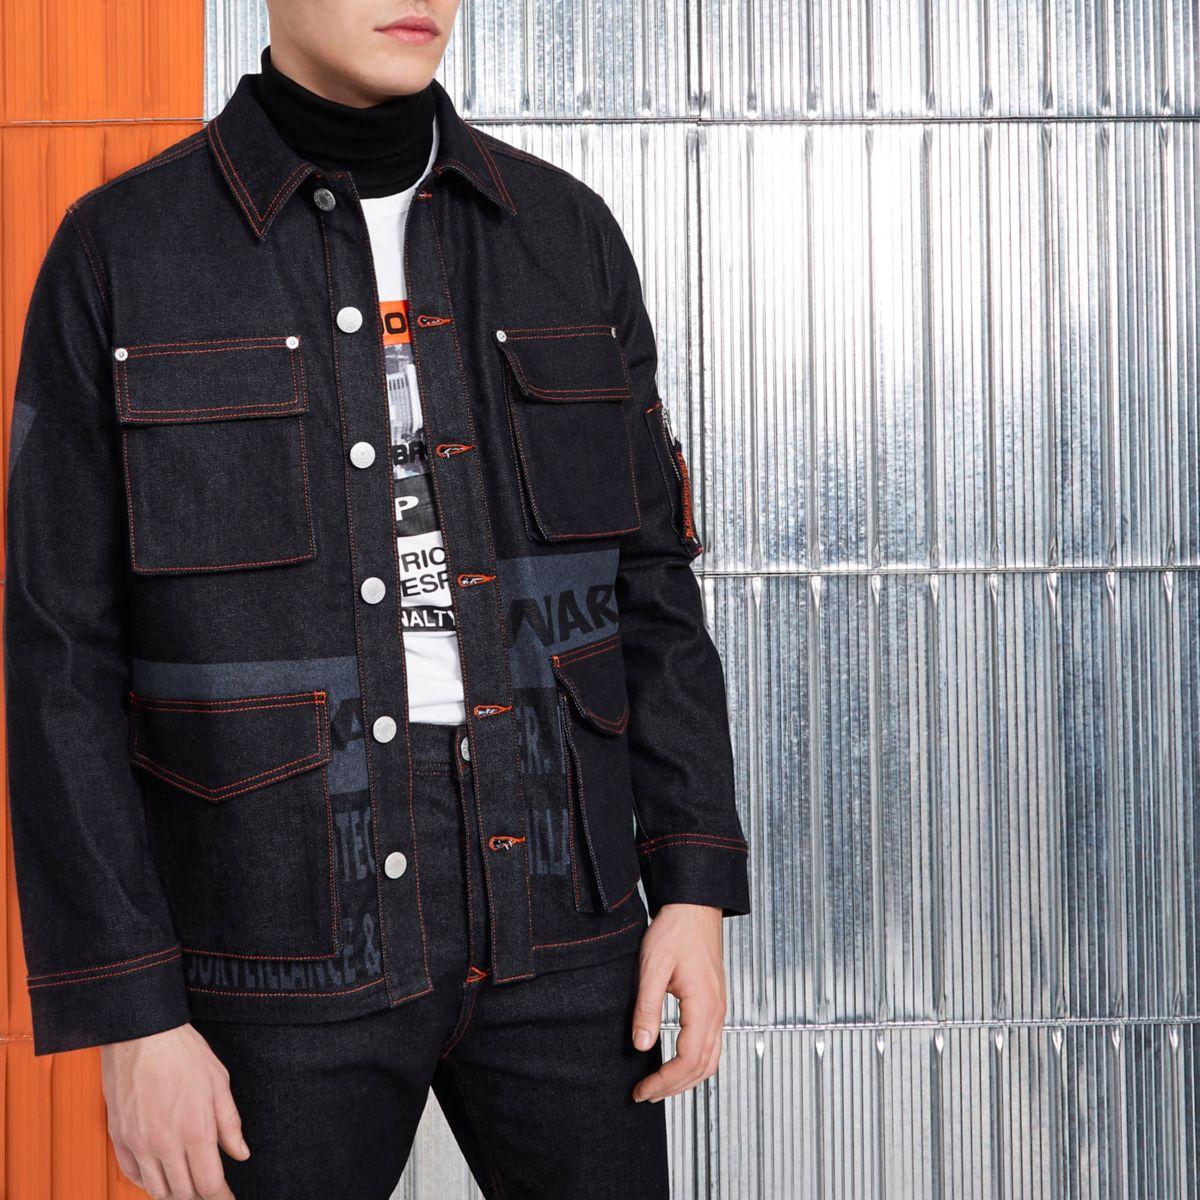 Navy Blood Brother denim jacket